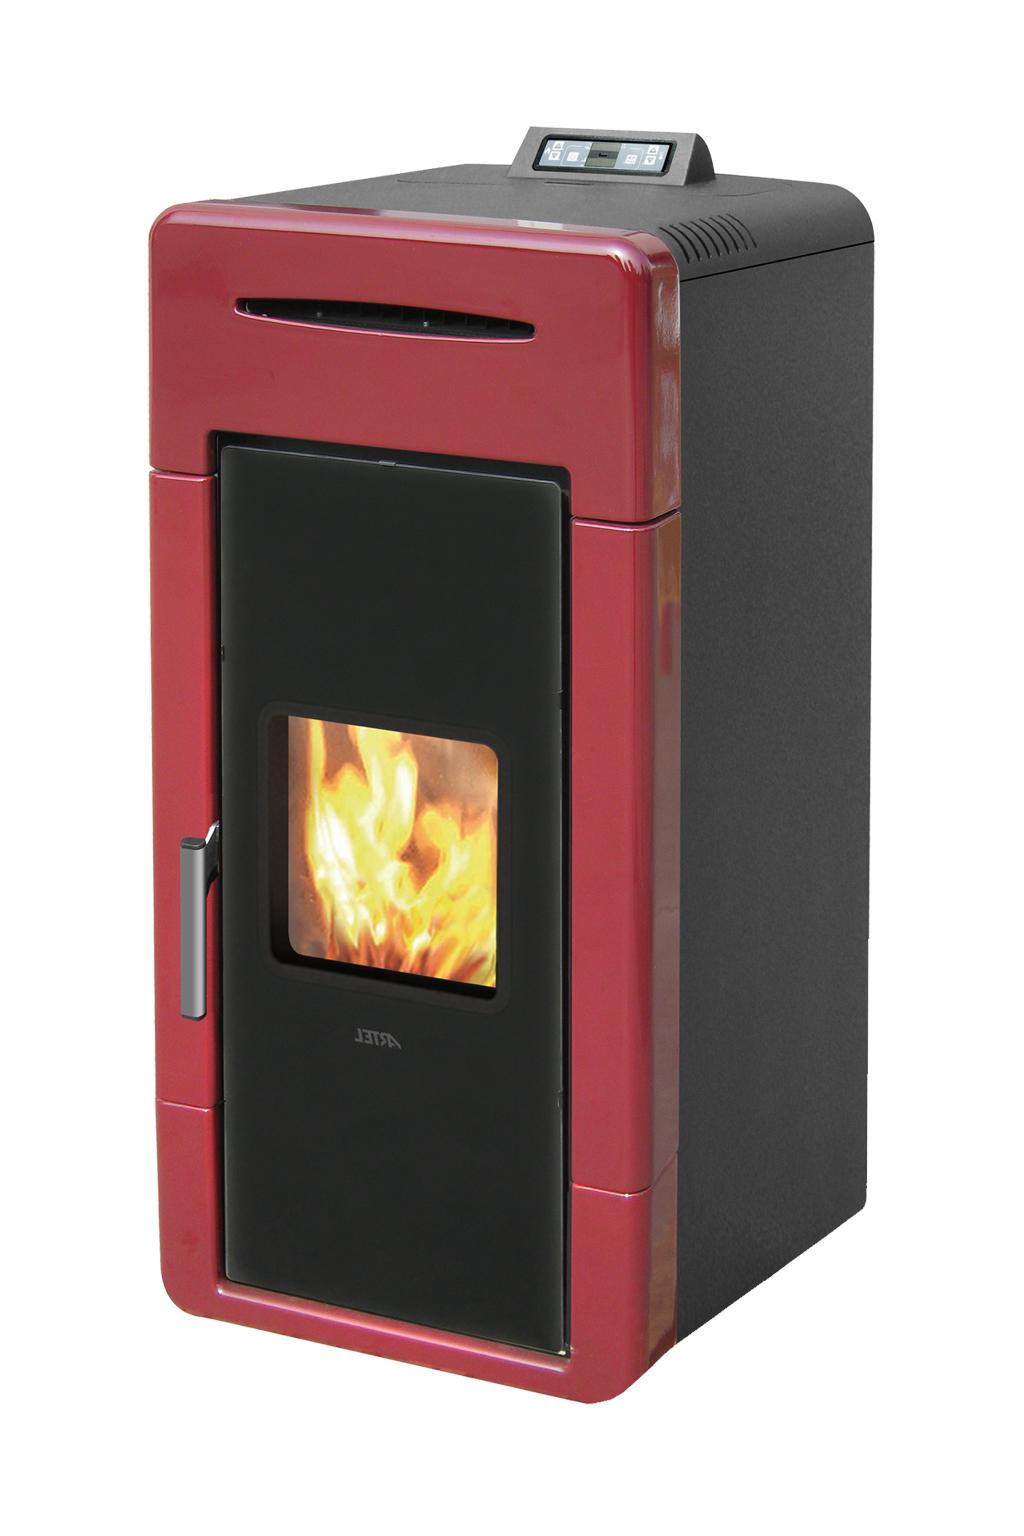 CV ceramic rood 28 kW - 540 kW